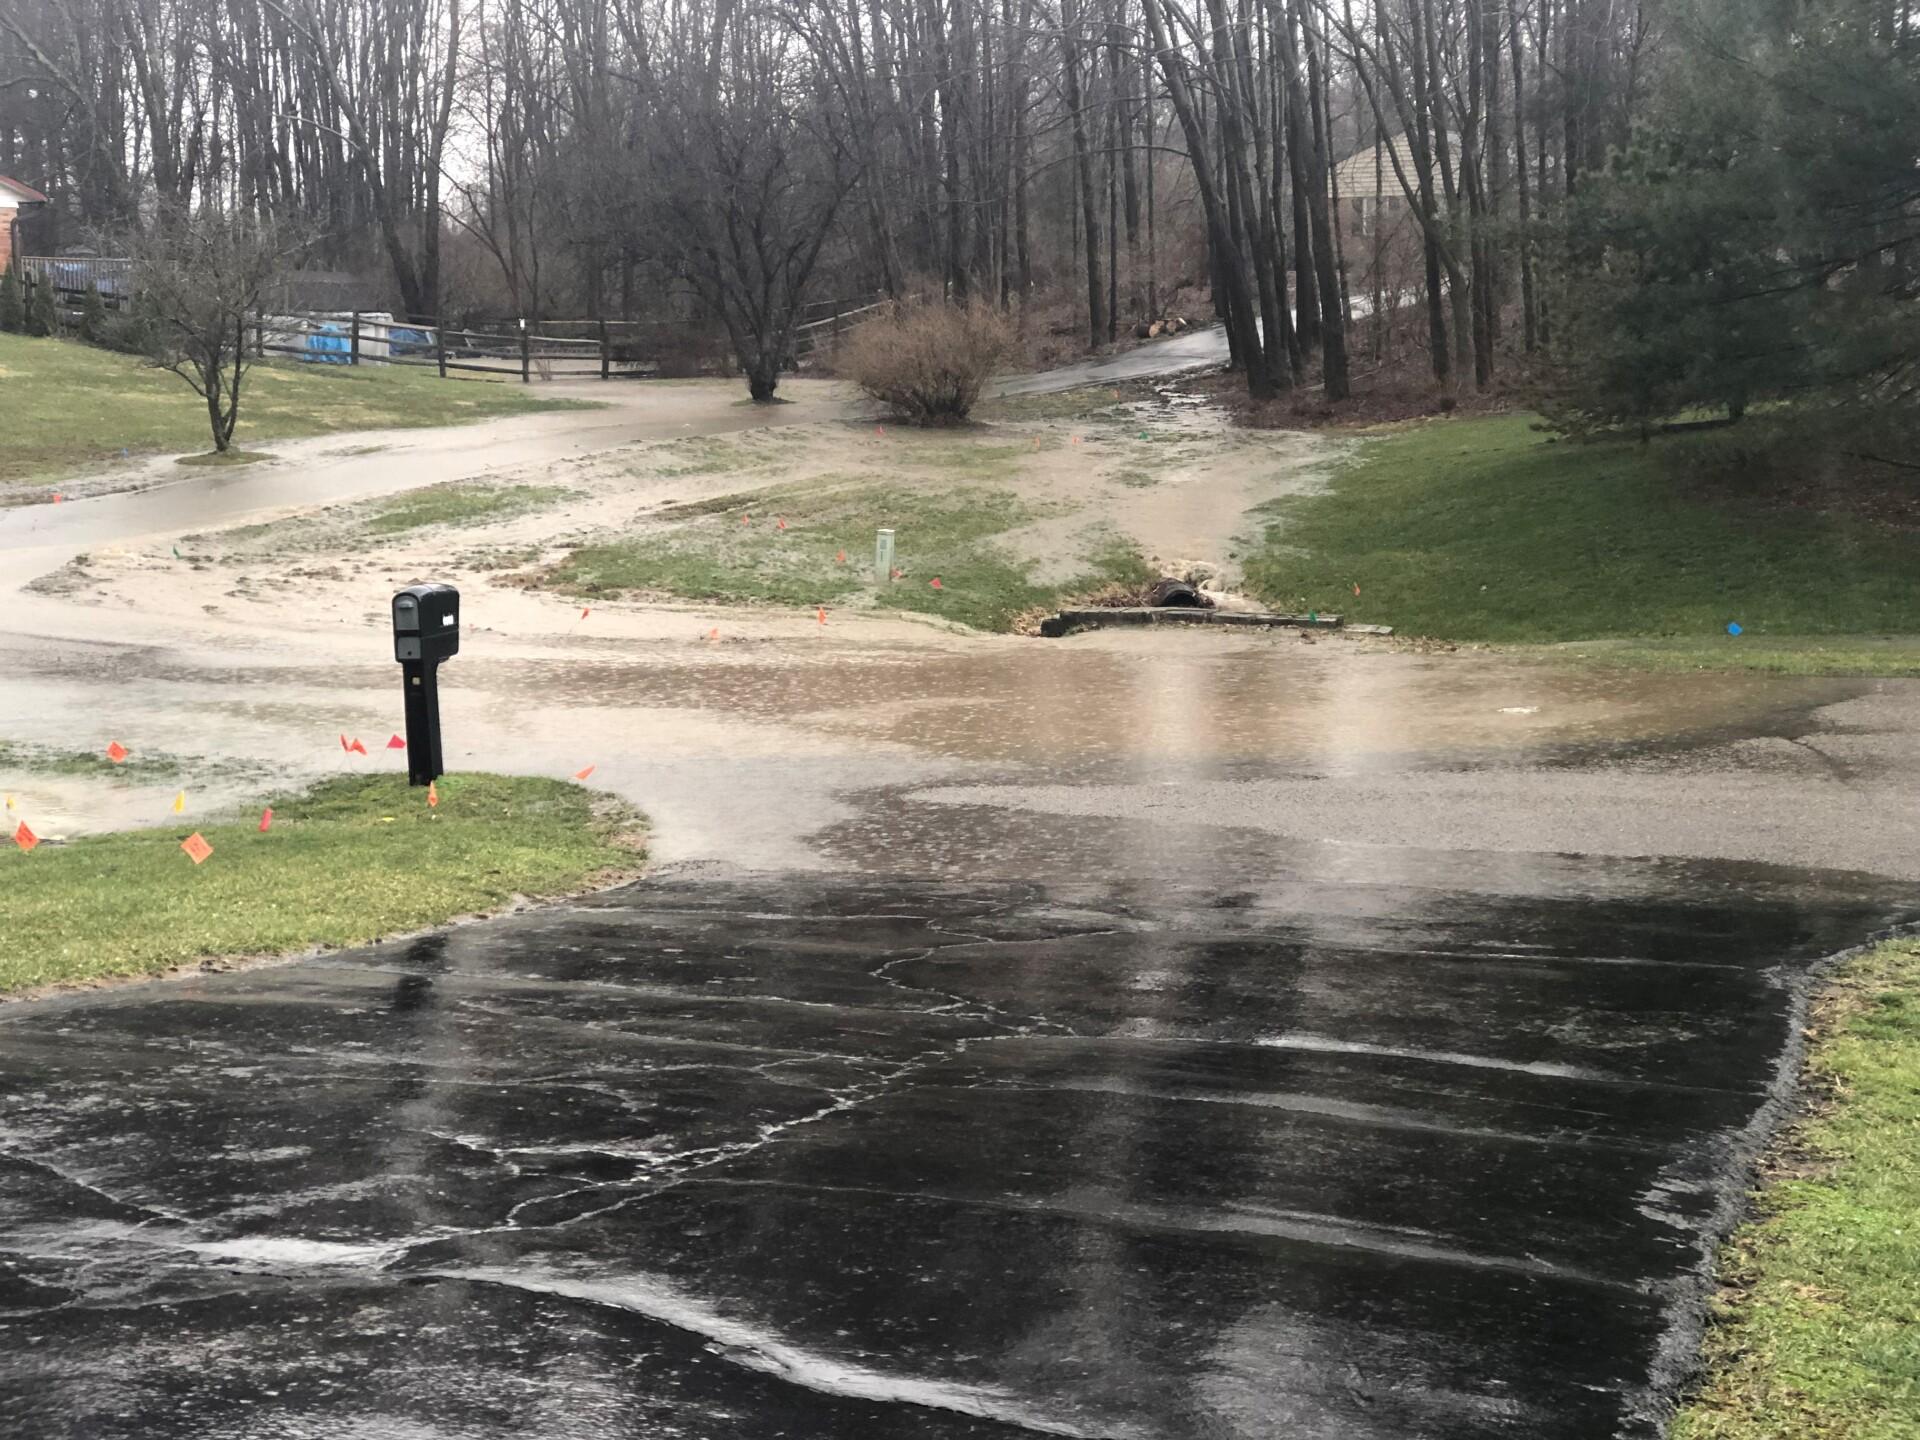 Storm_031419_Hail off Branch Hill Guinea Pike_Deborah Short.jpg